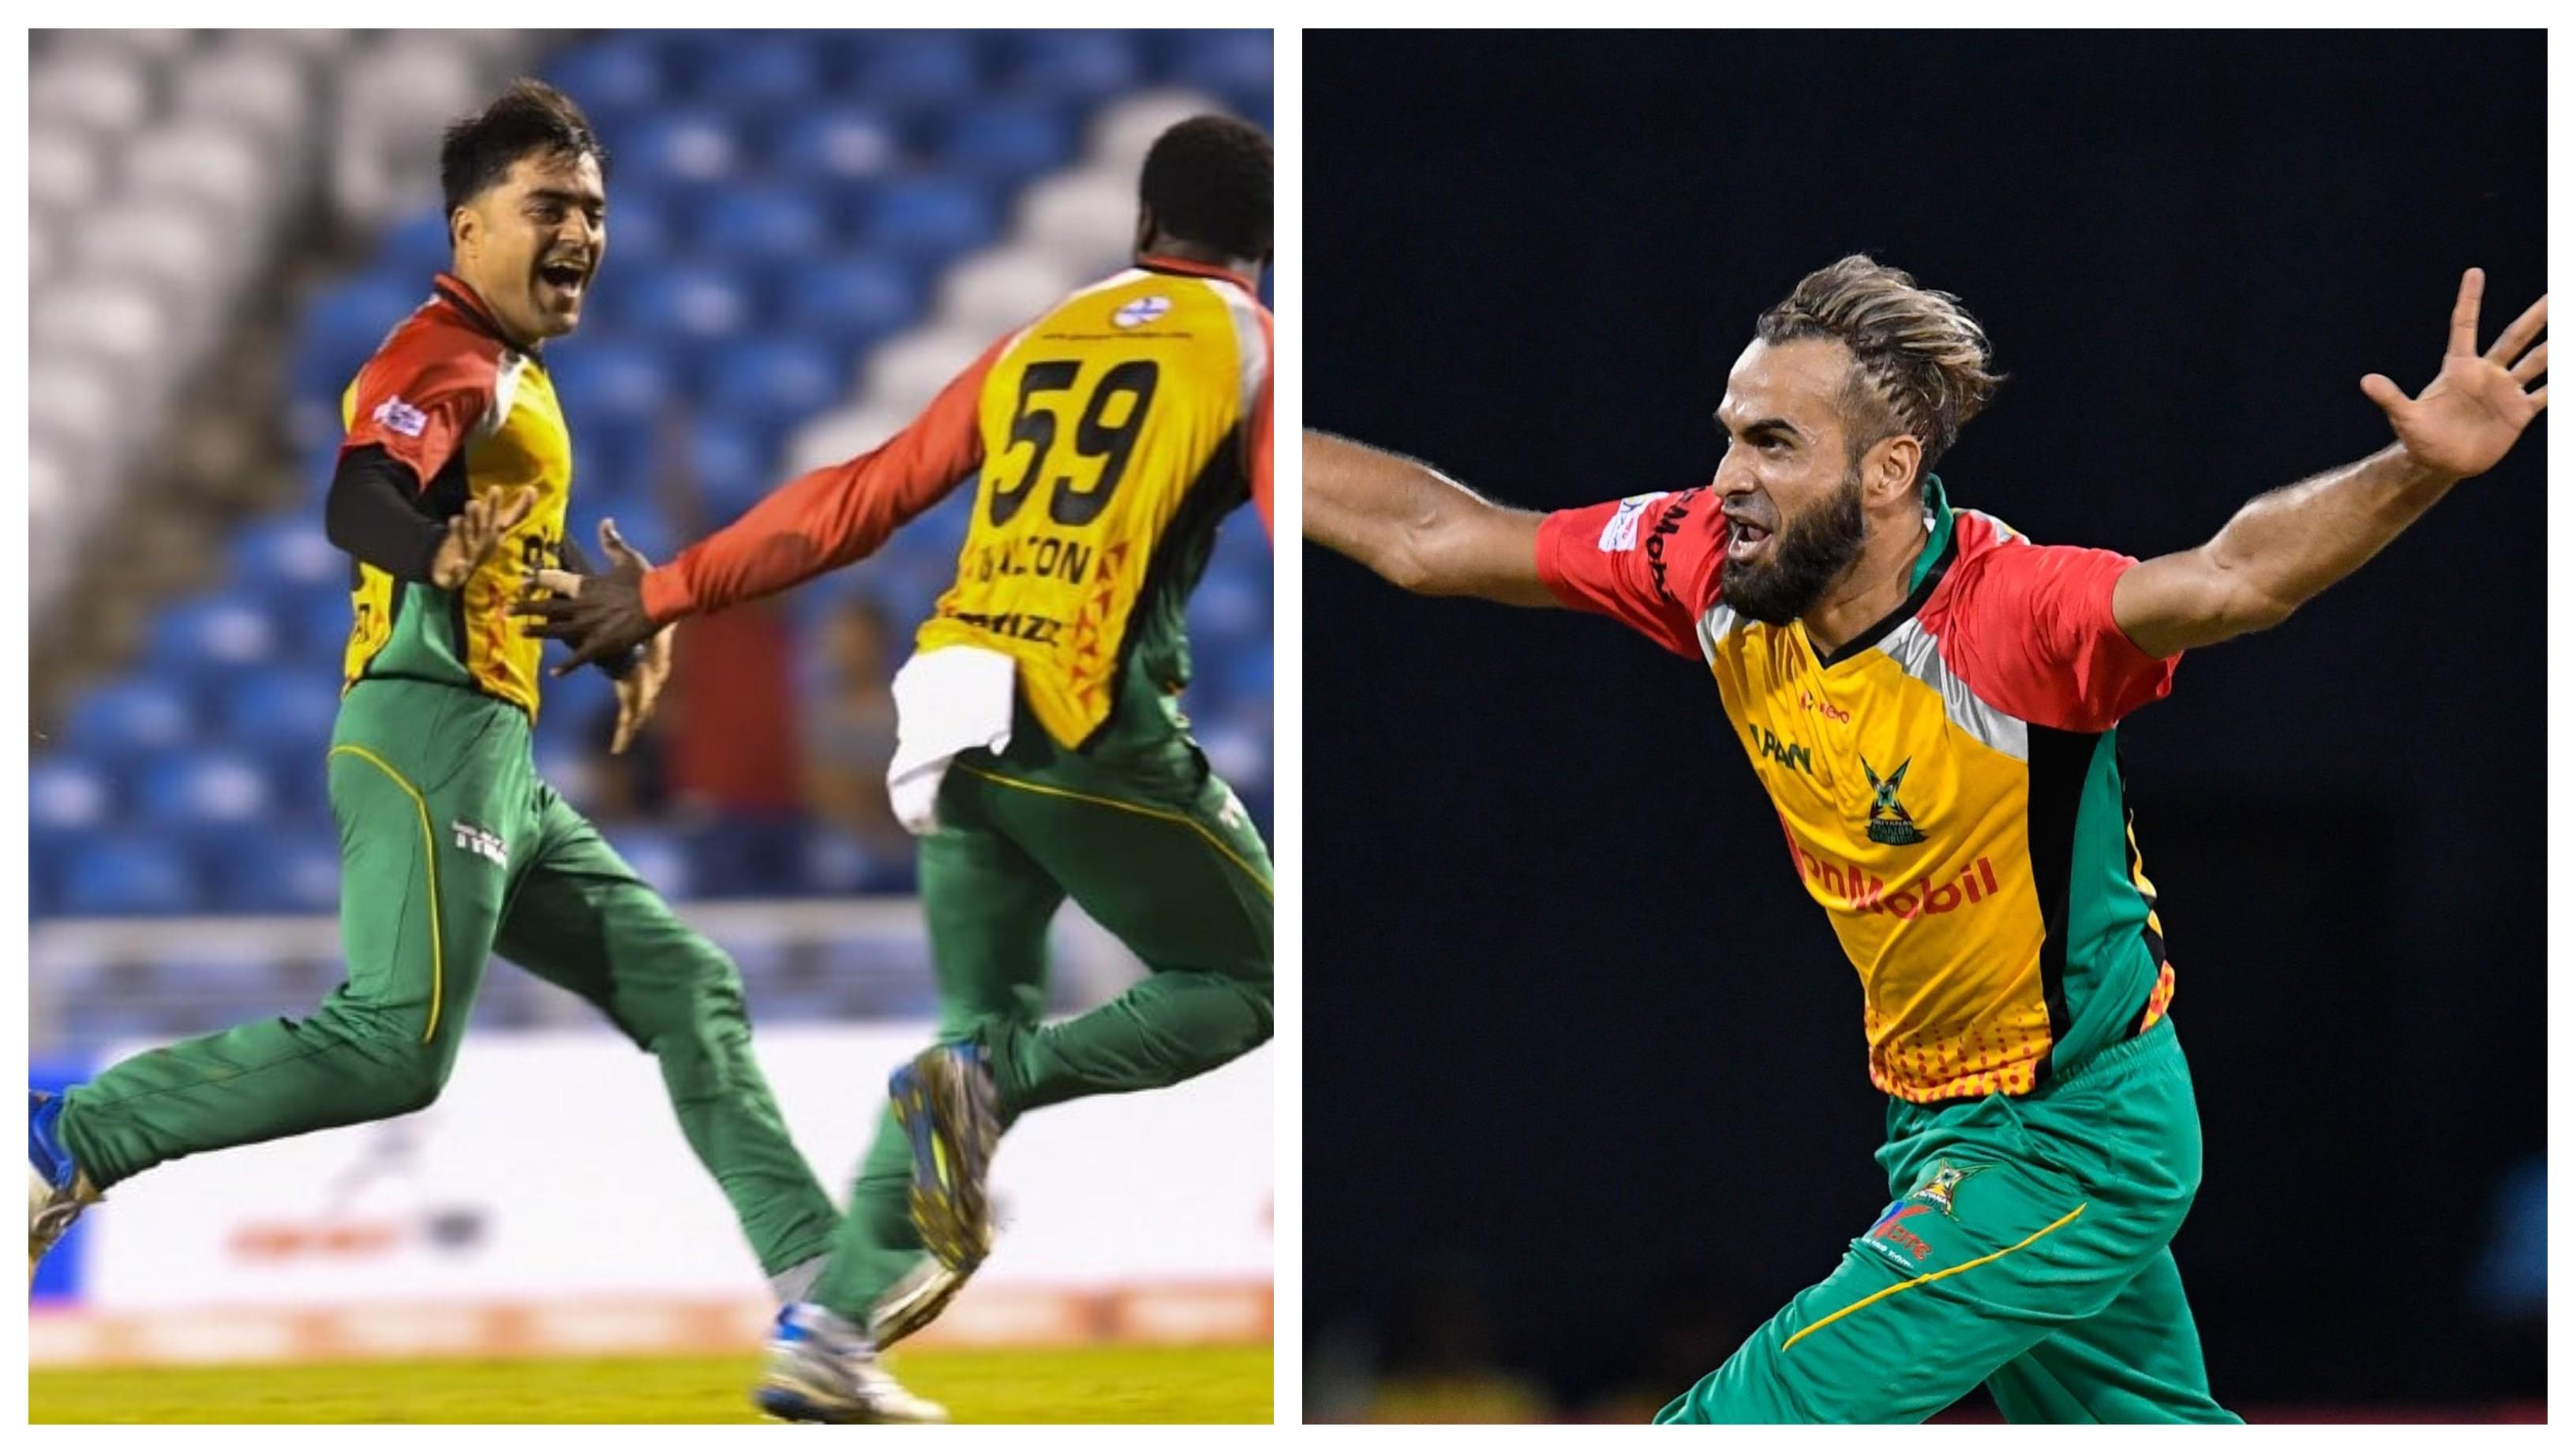 CPL 2020 Draft: Barbados Tridents pick Rashid Khan; Imran Tahir returns to Guyana Amazon Warriors